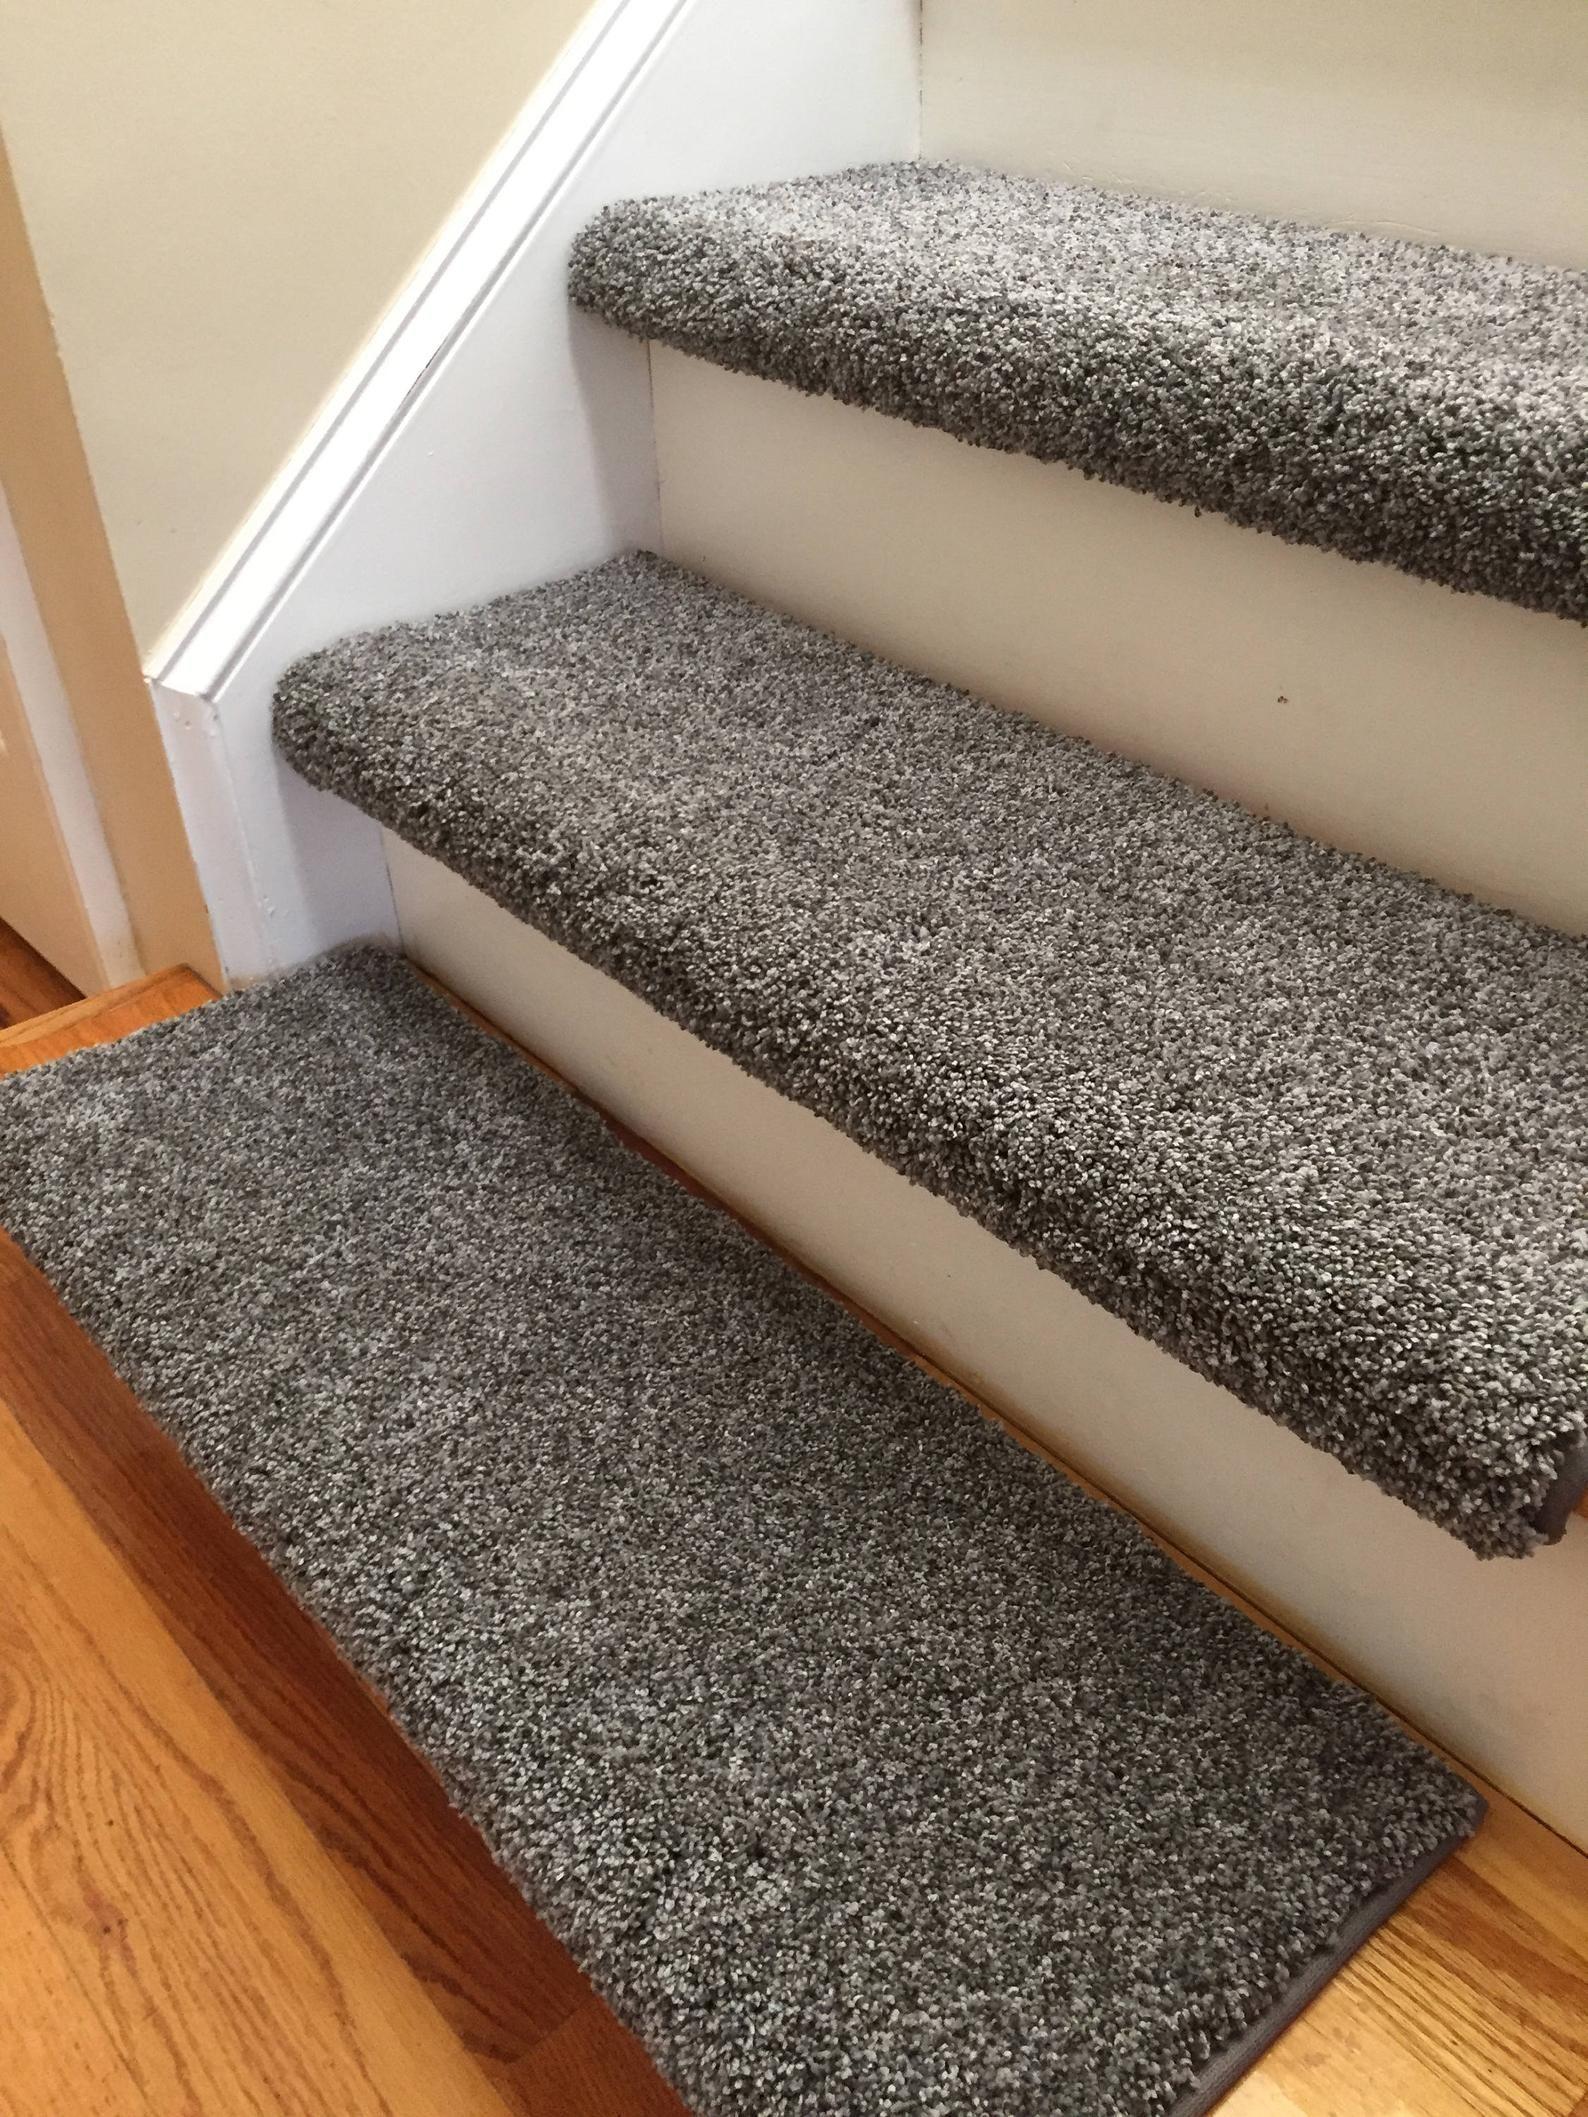 Product Description This Thick Plush Carpet Is Made In The Usa | Plush Carpet Stair Treads | True Bullnose Carpet | Super Soft | Anti Slip | Wool Carpet | Wall Carpet